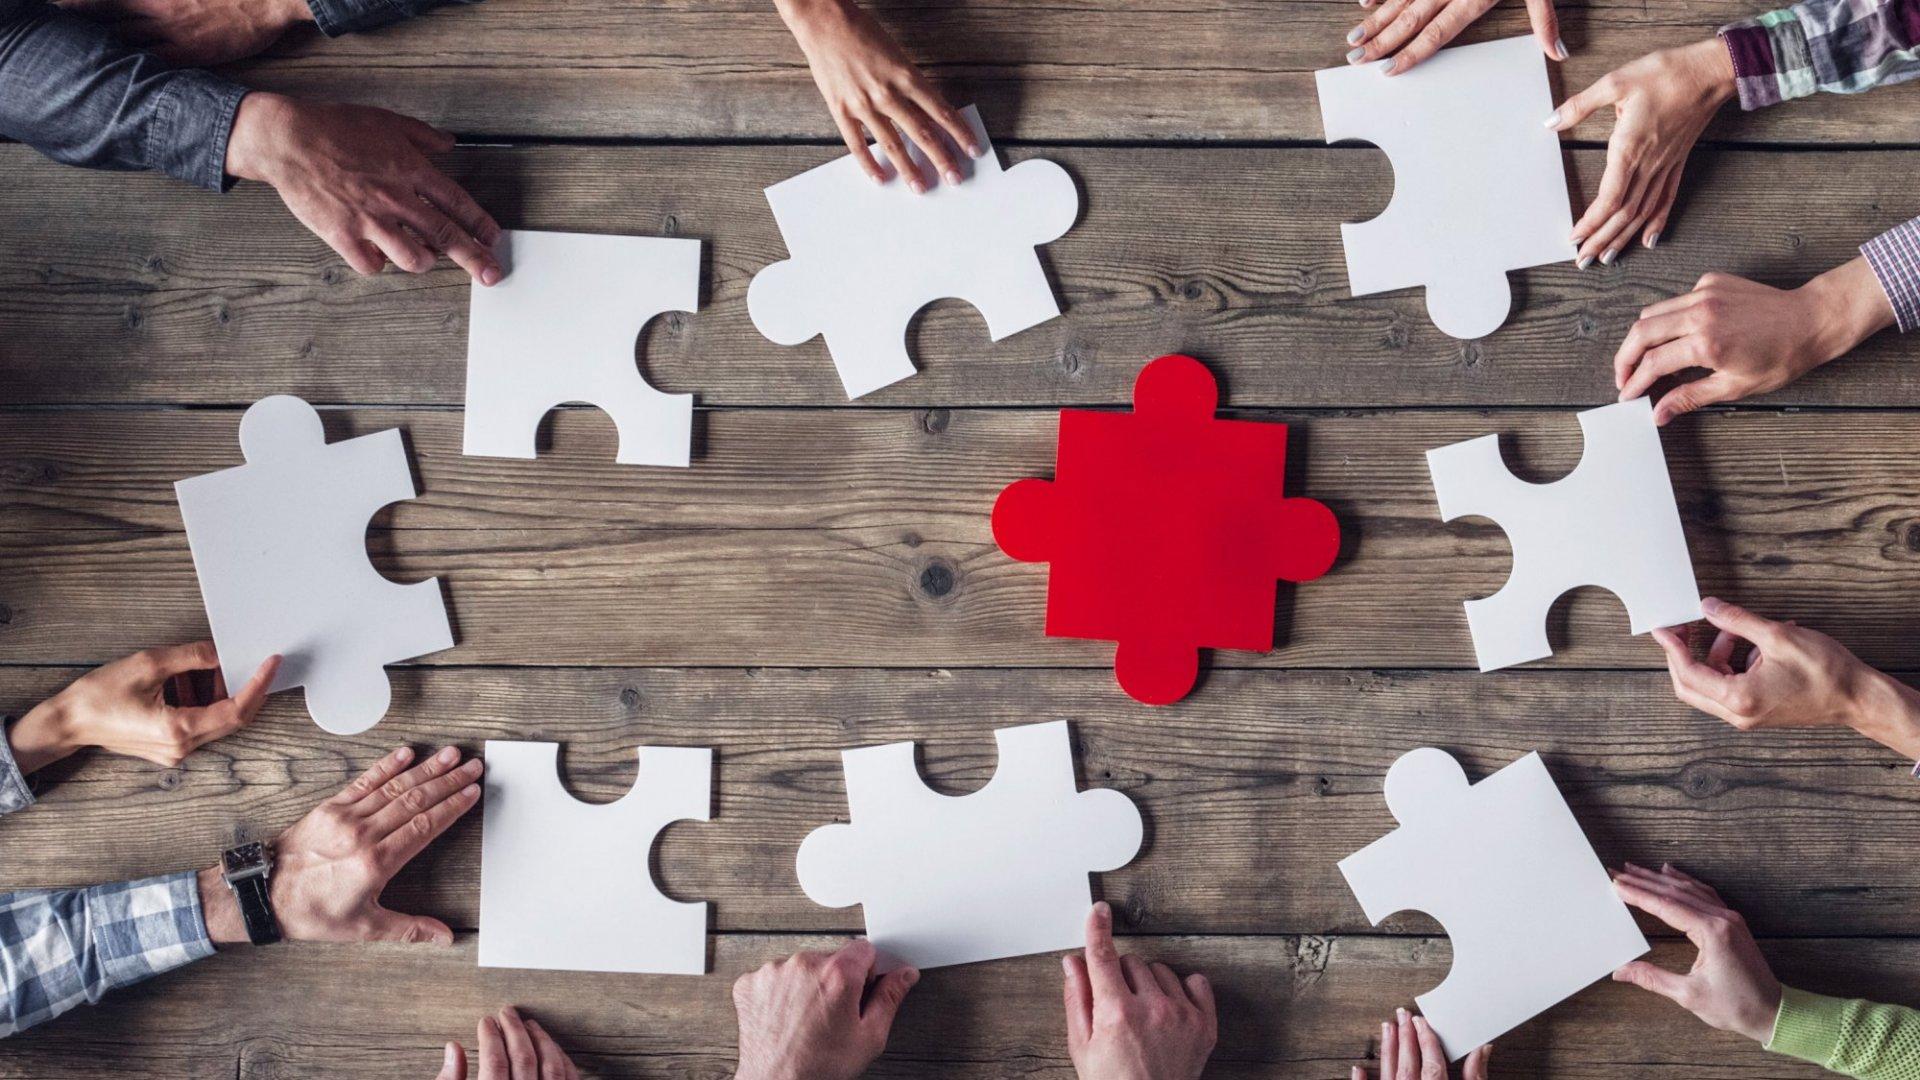 3 Surprising Ways to Develop Problem-Solving Teams